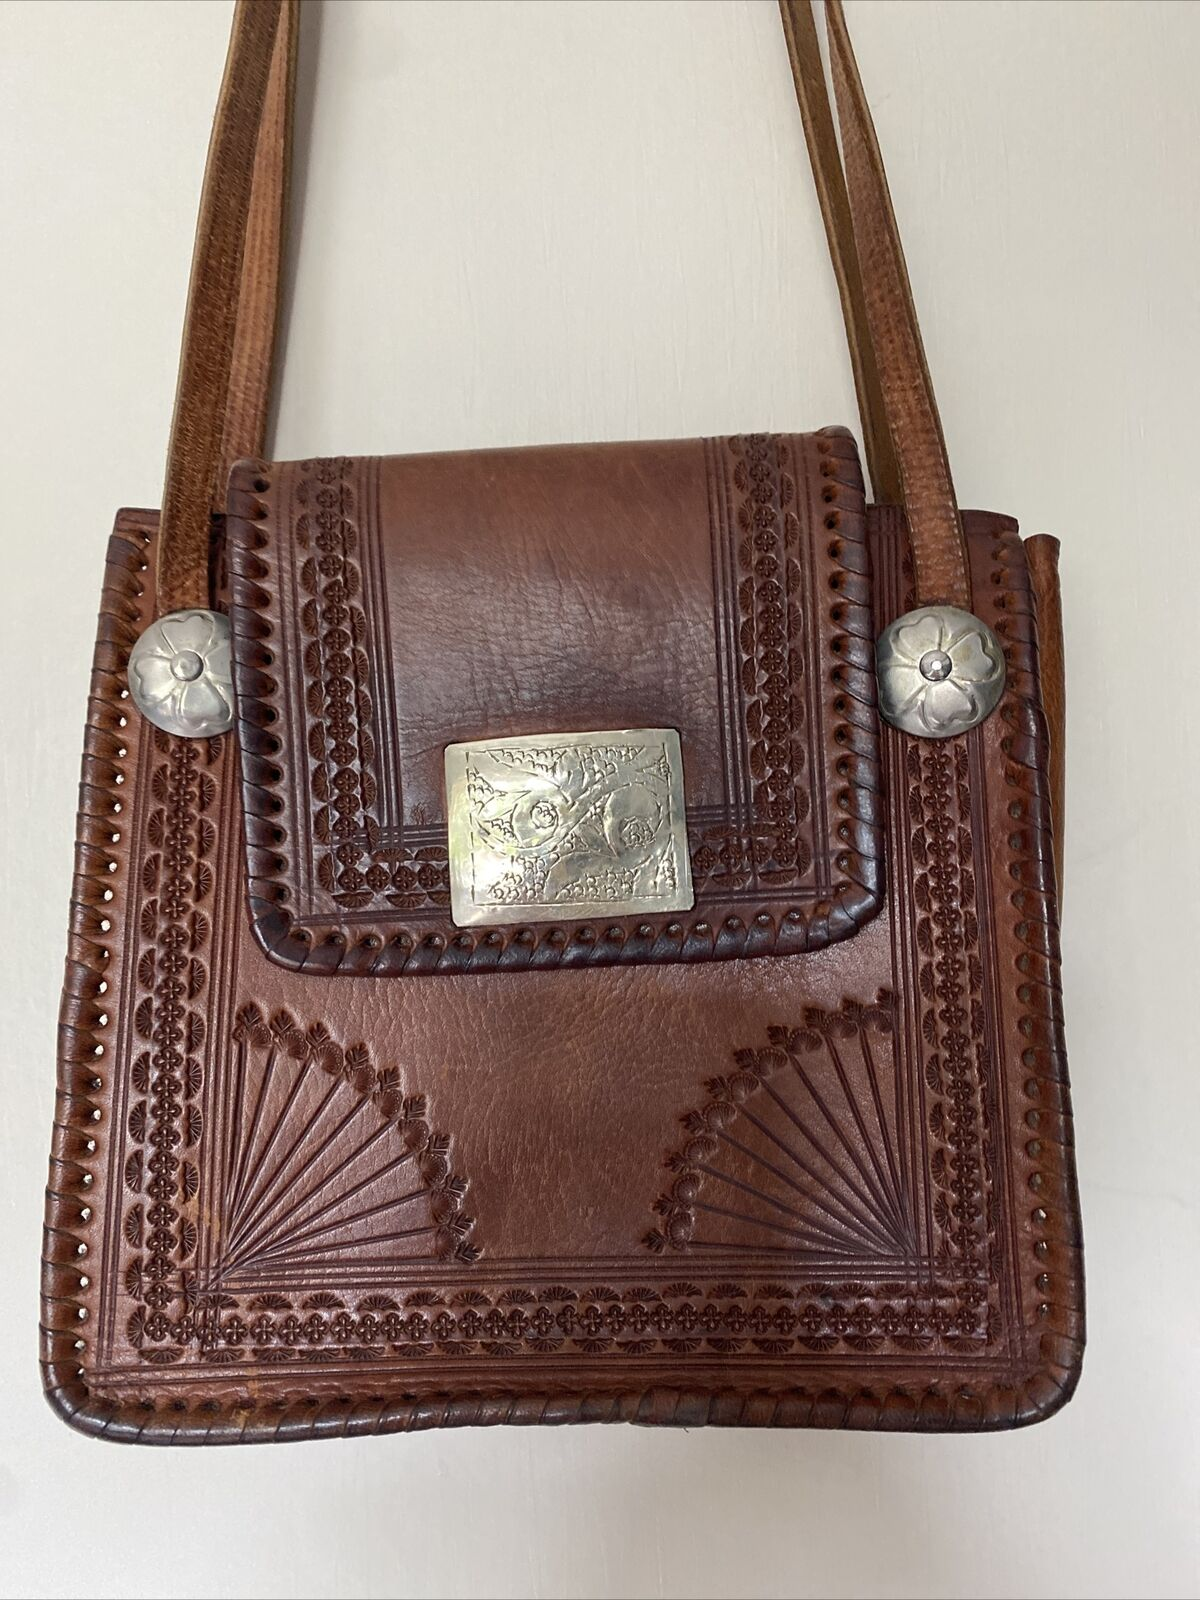 Tan Leather Boho Look Handbag